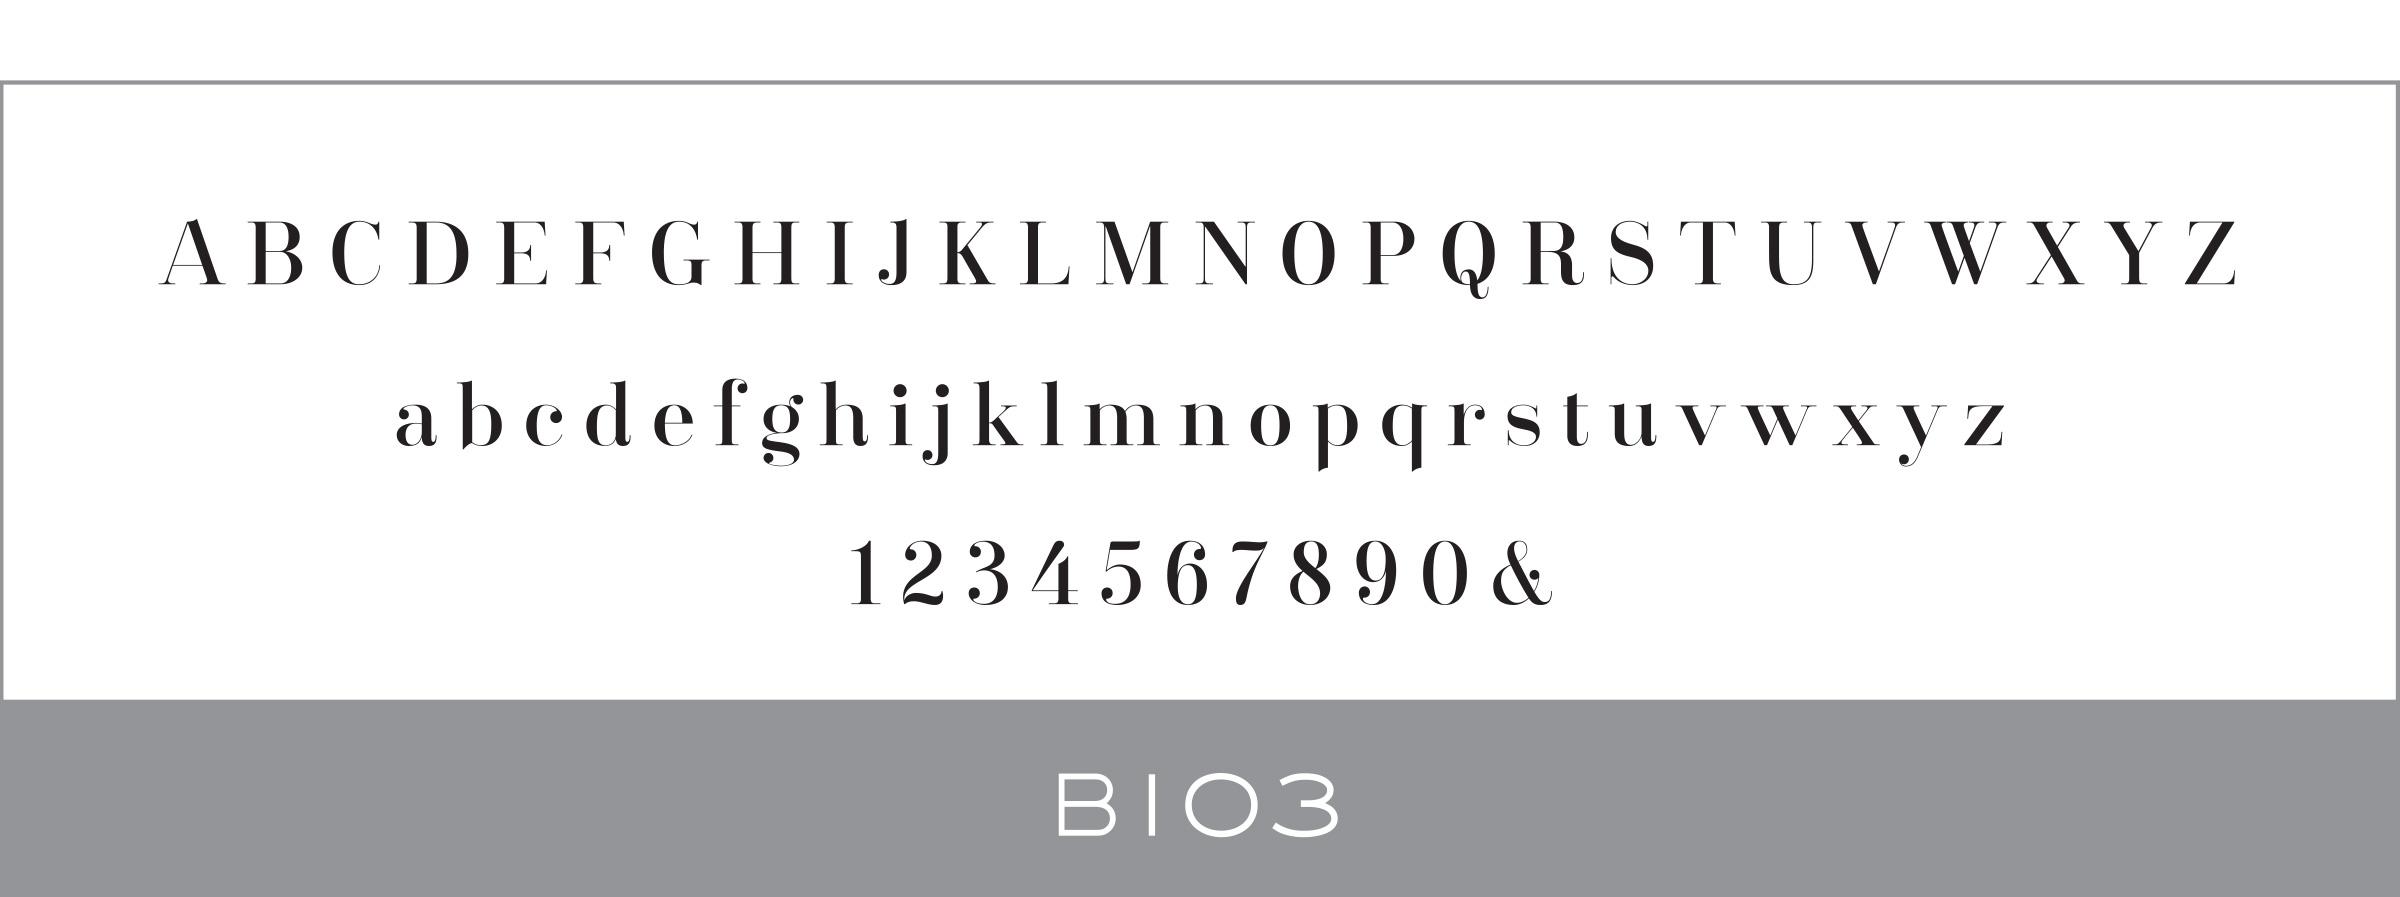 B103_Haute_Papier_Font.jpg